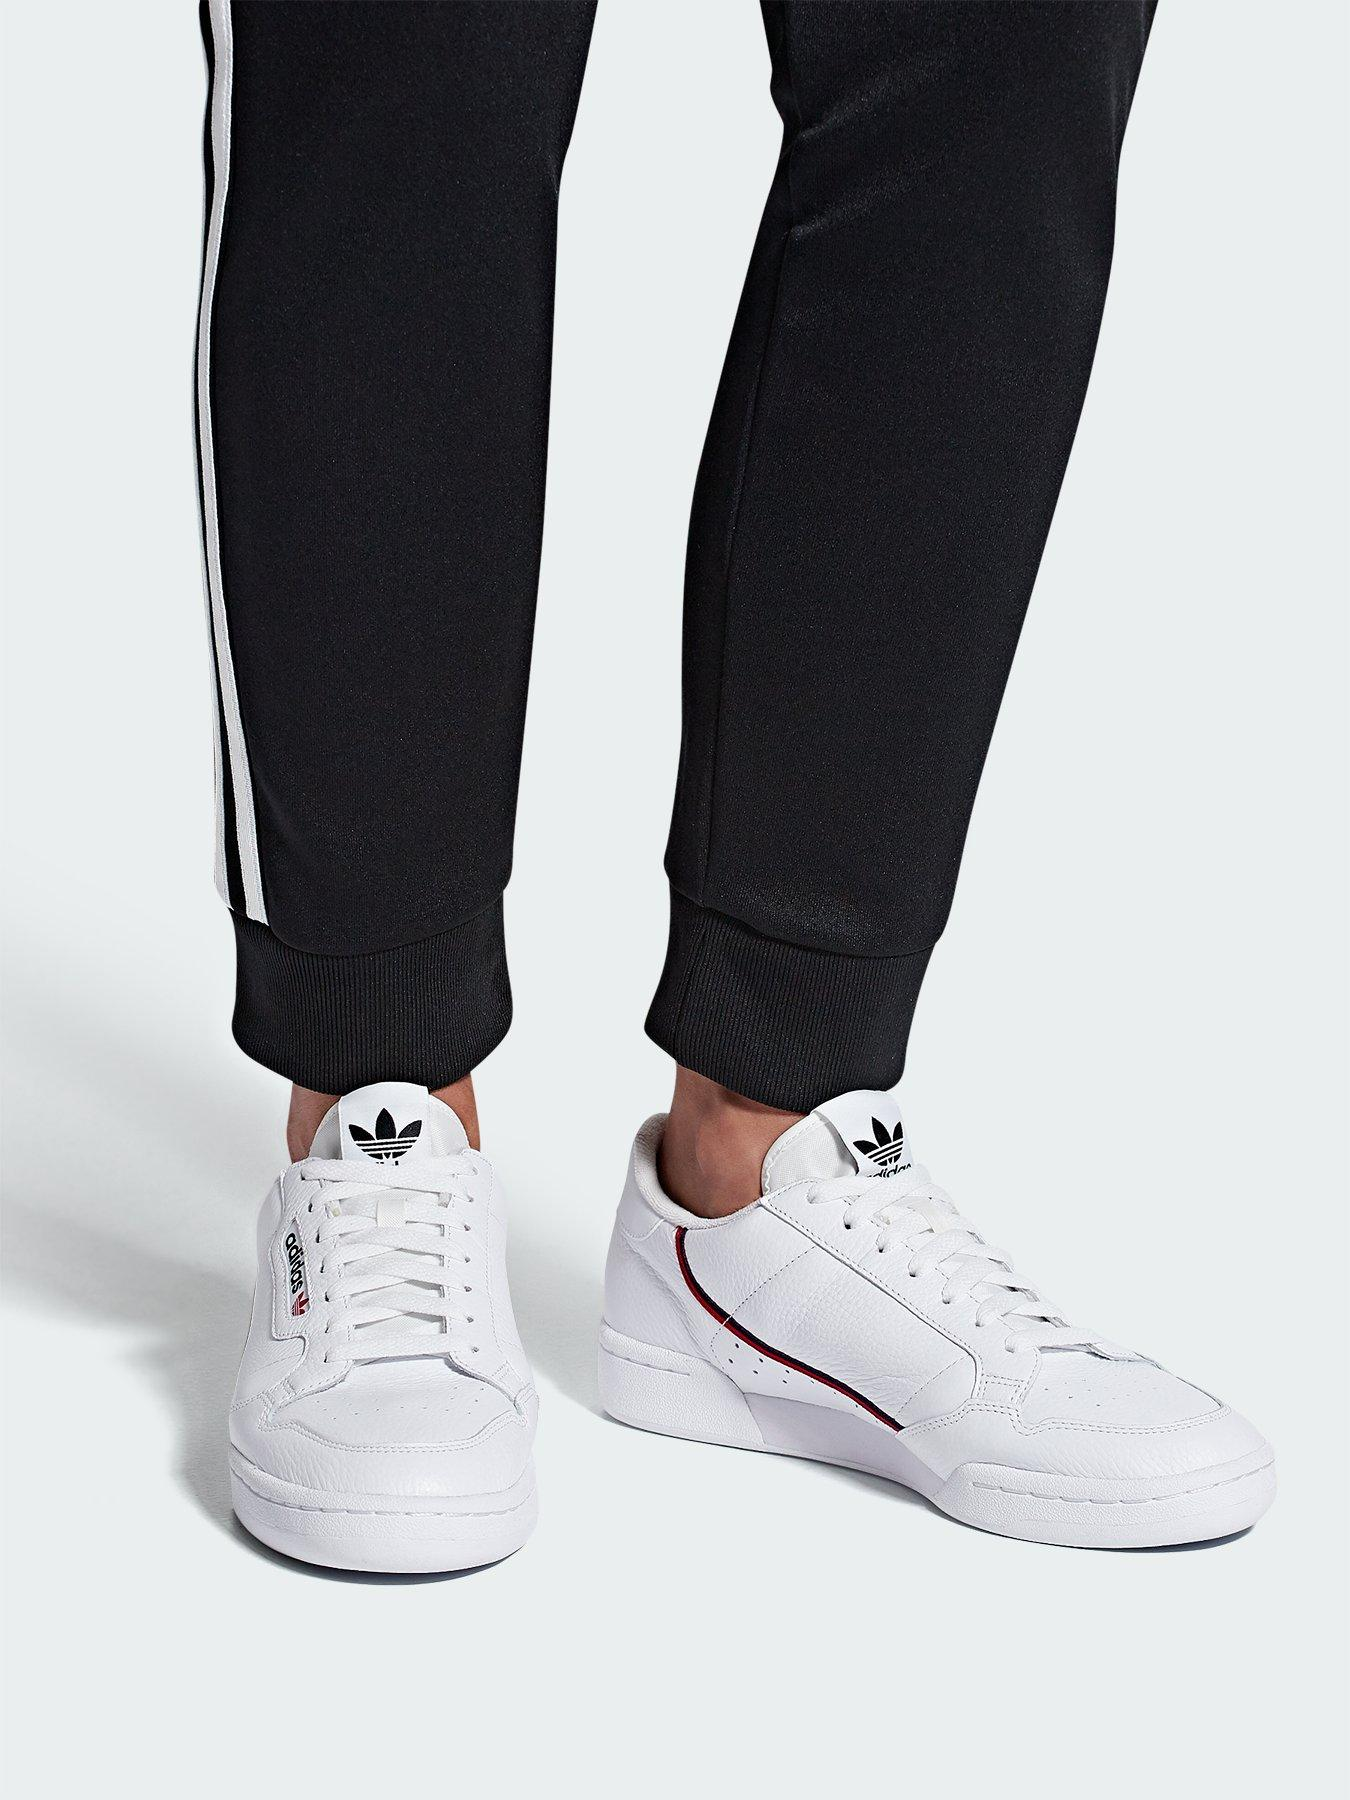 adidas Originals Continental 80 - White